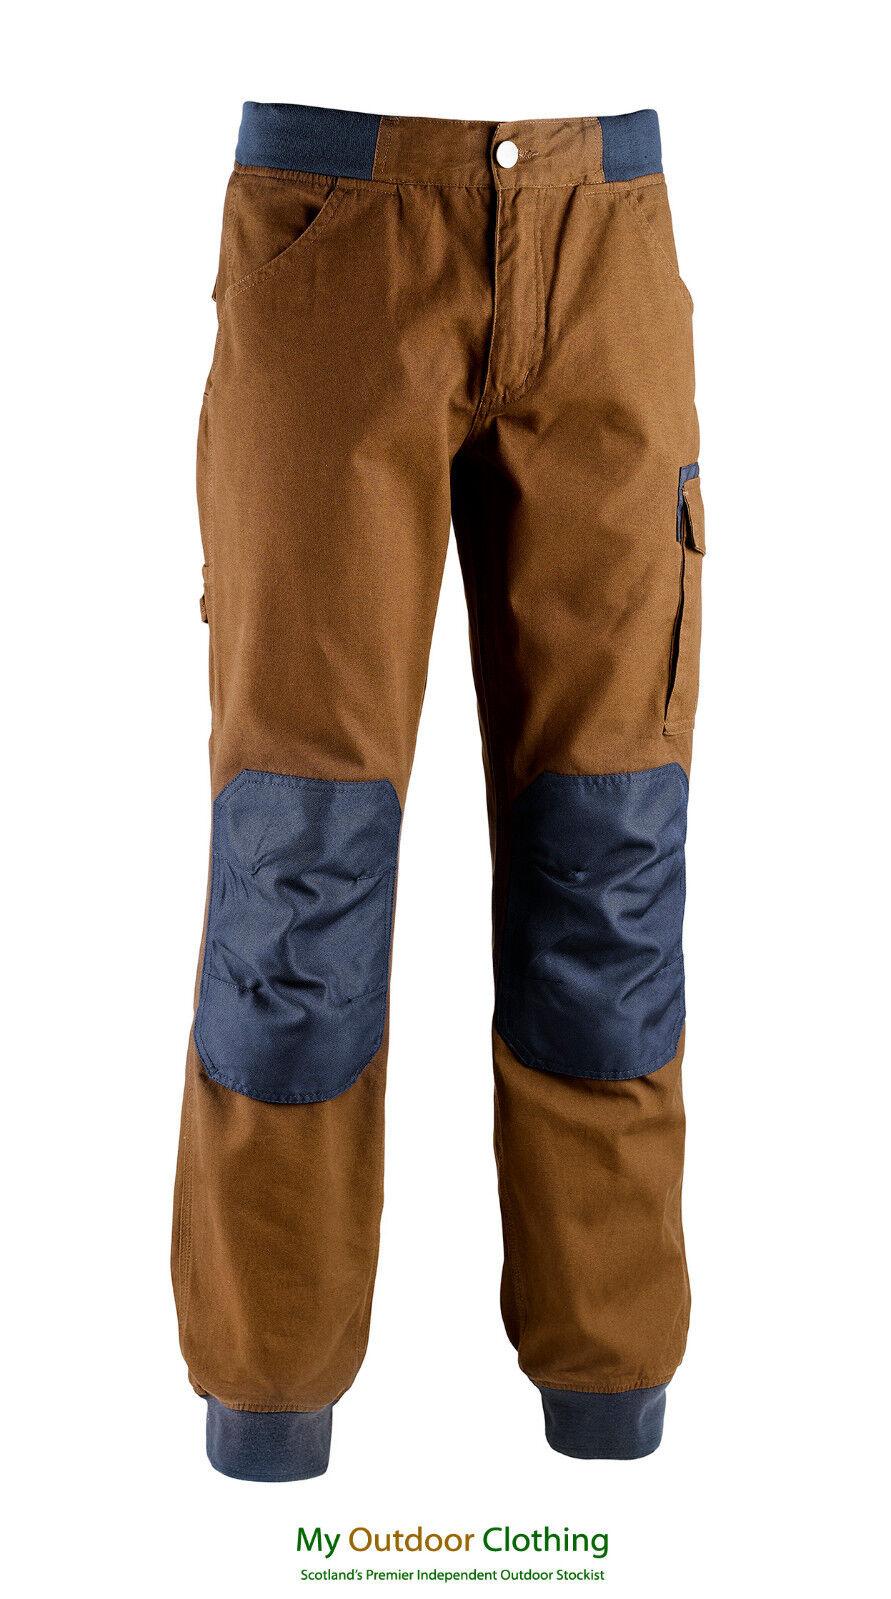 Details about Diadora Utility Workwear Mens Cotton Work Trousers Parkour BrownNavy